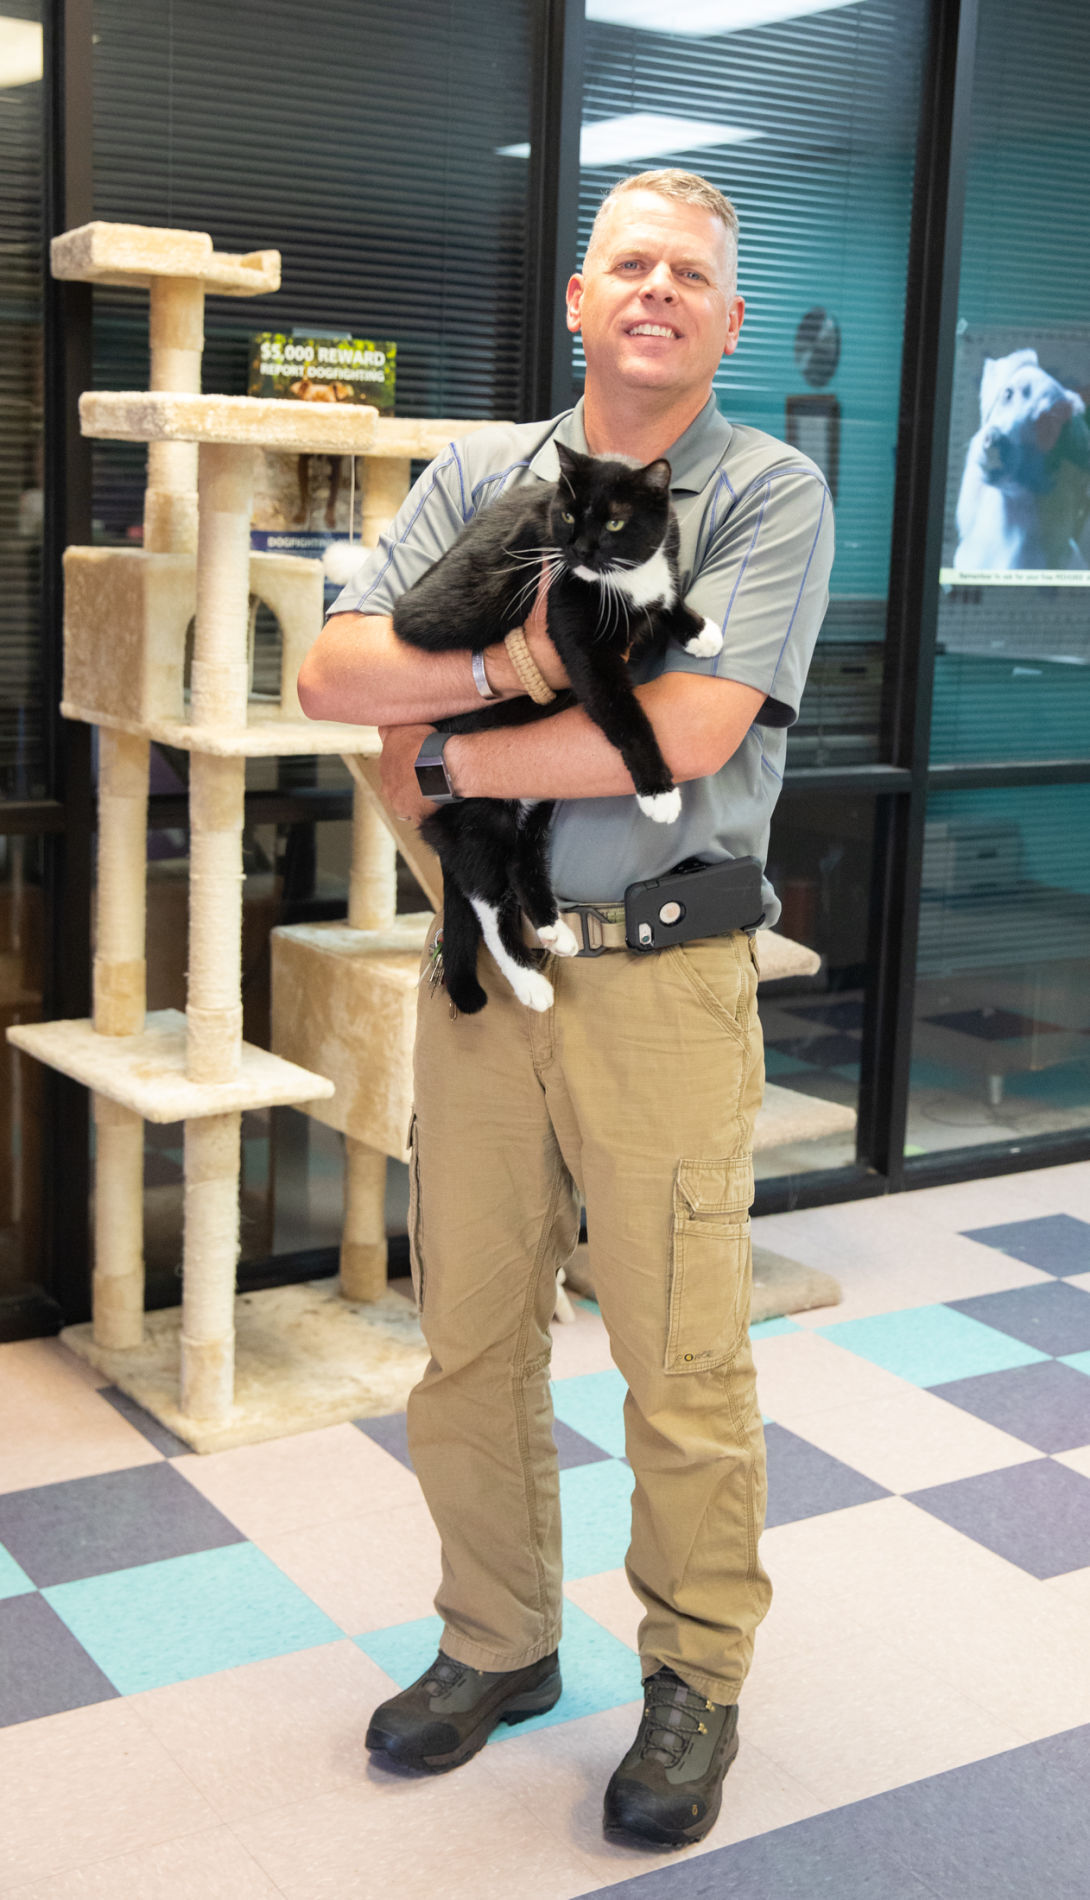 Aaron Ramsey at the Kurth Memorial Animal Shelter